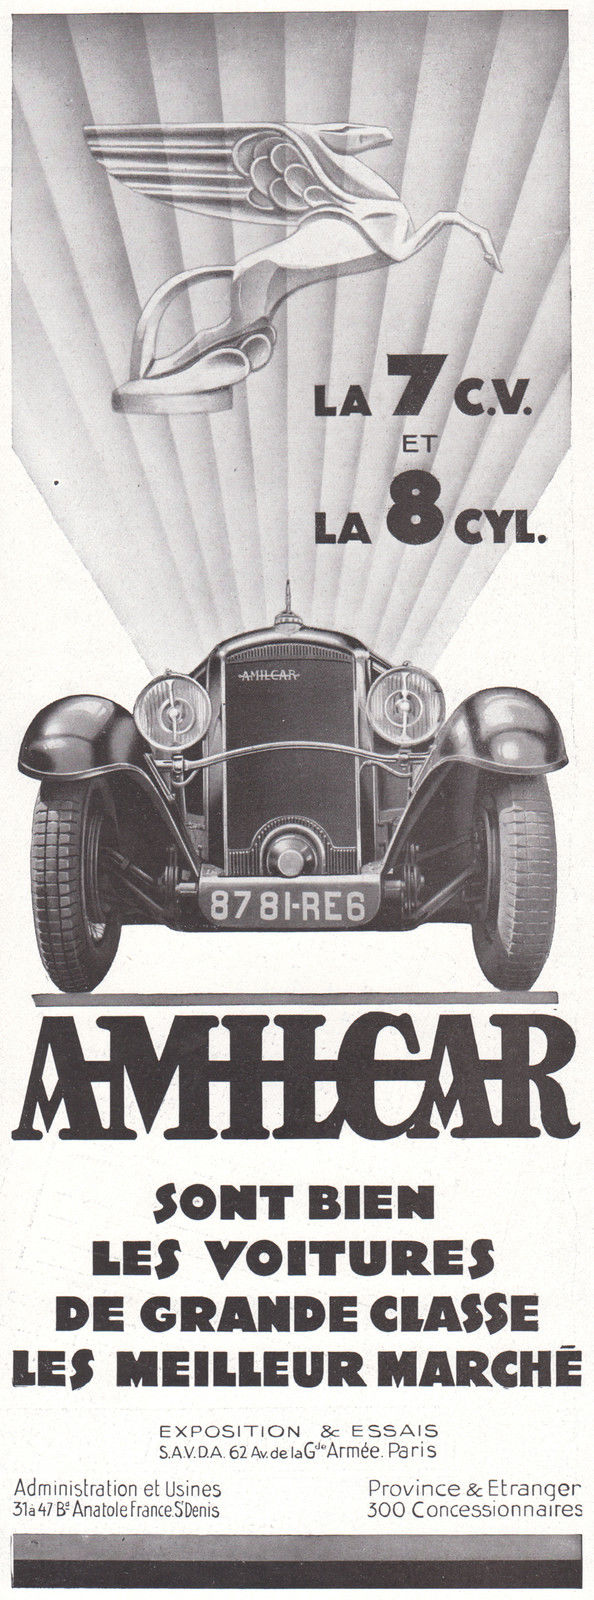 1931 Print Ad Amilcar Autos 7CV 8 Cylinders